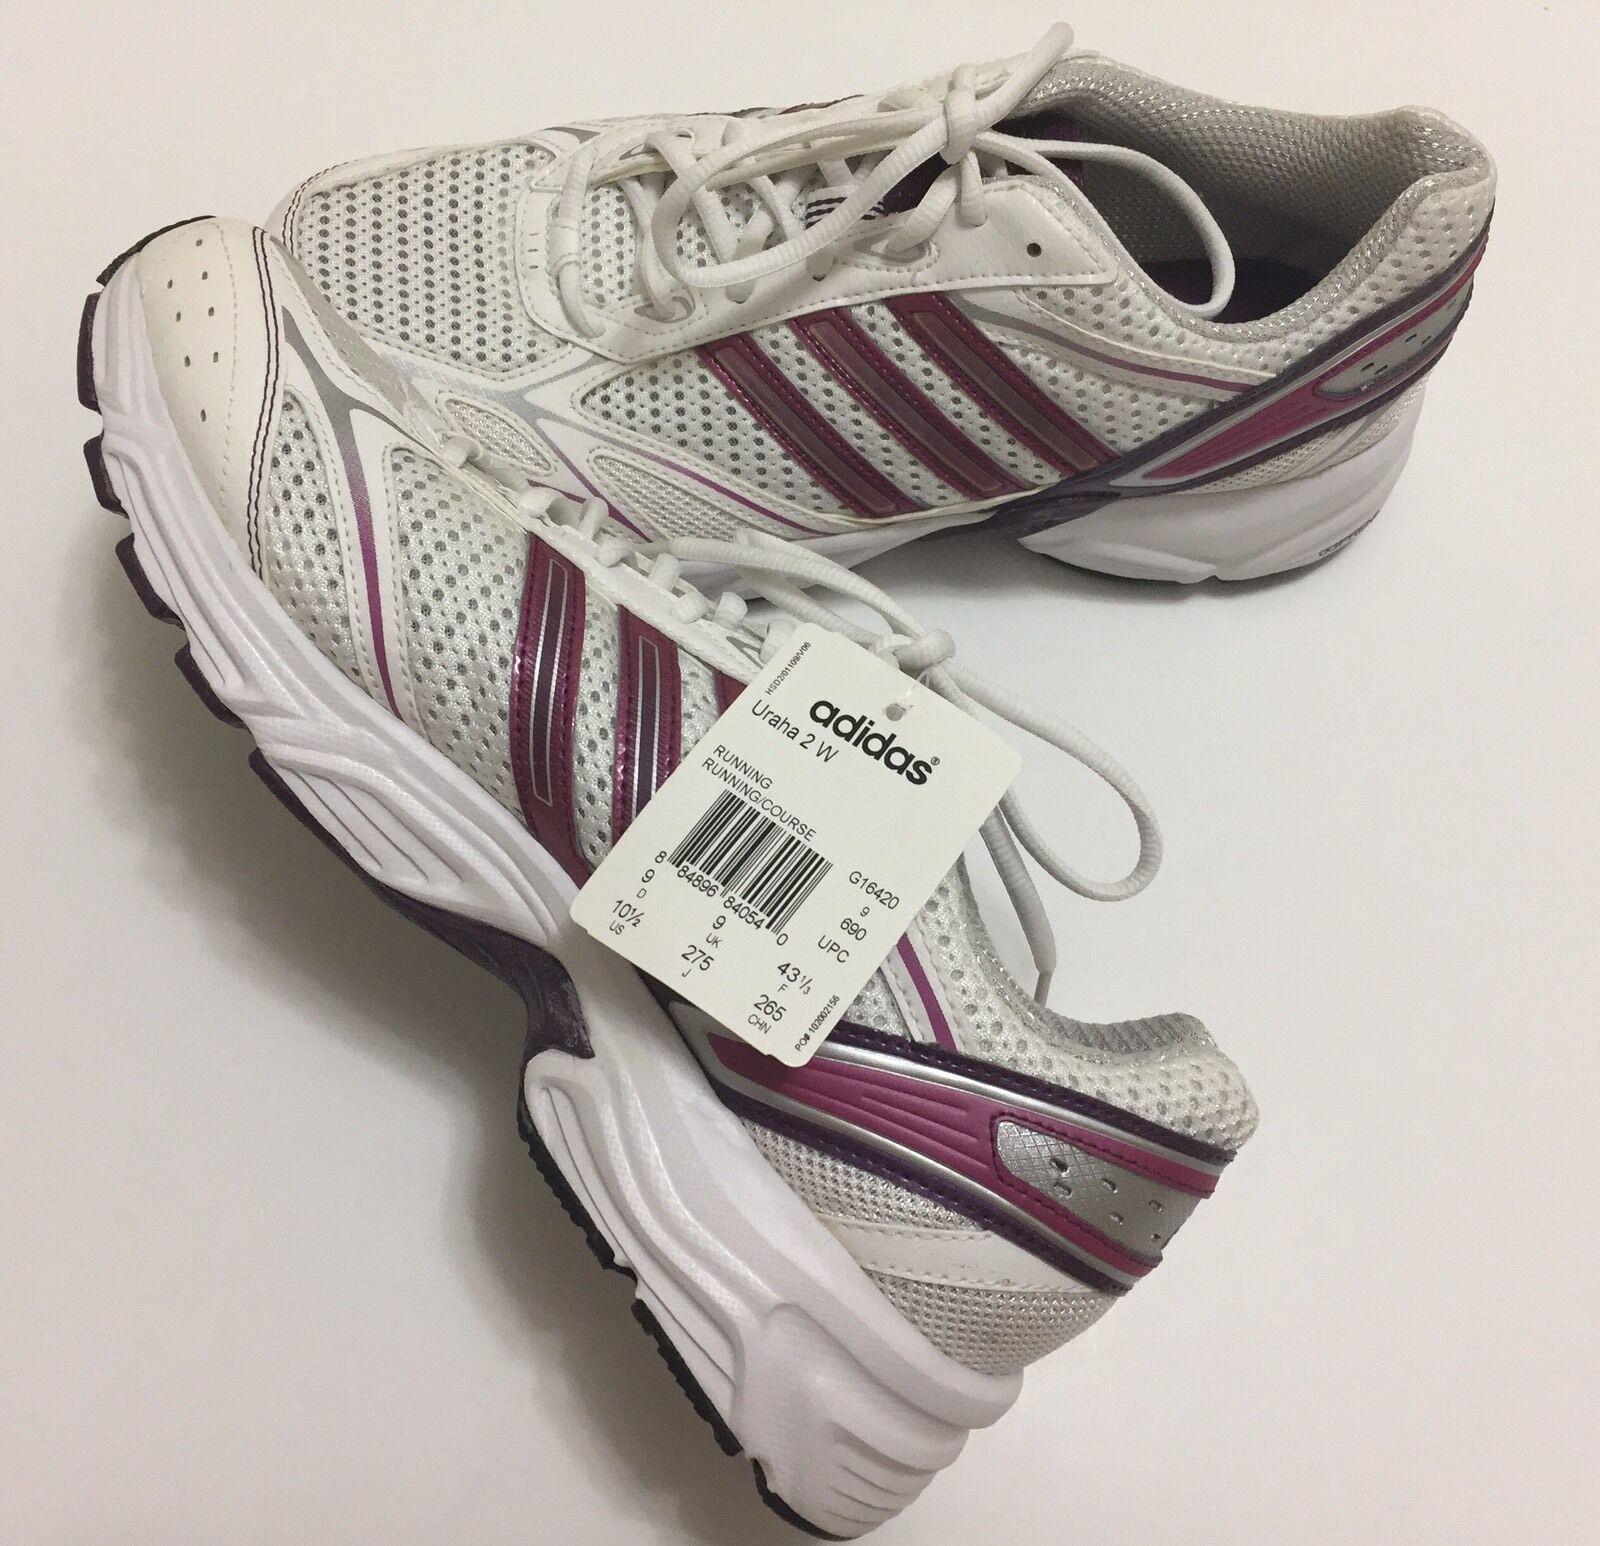 Adidas Women's Uraha 2 W Size 10.5 Running shoes White Purple Pink G16420 NEW